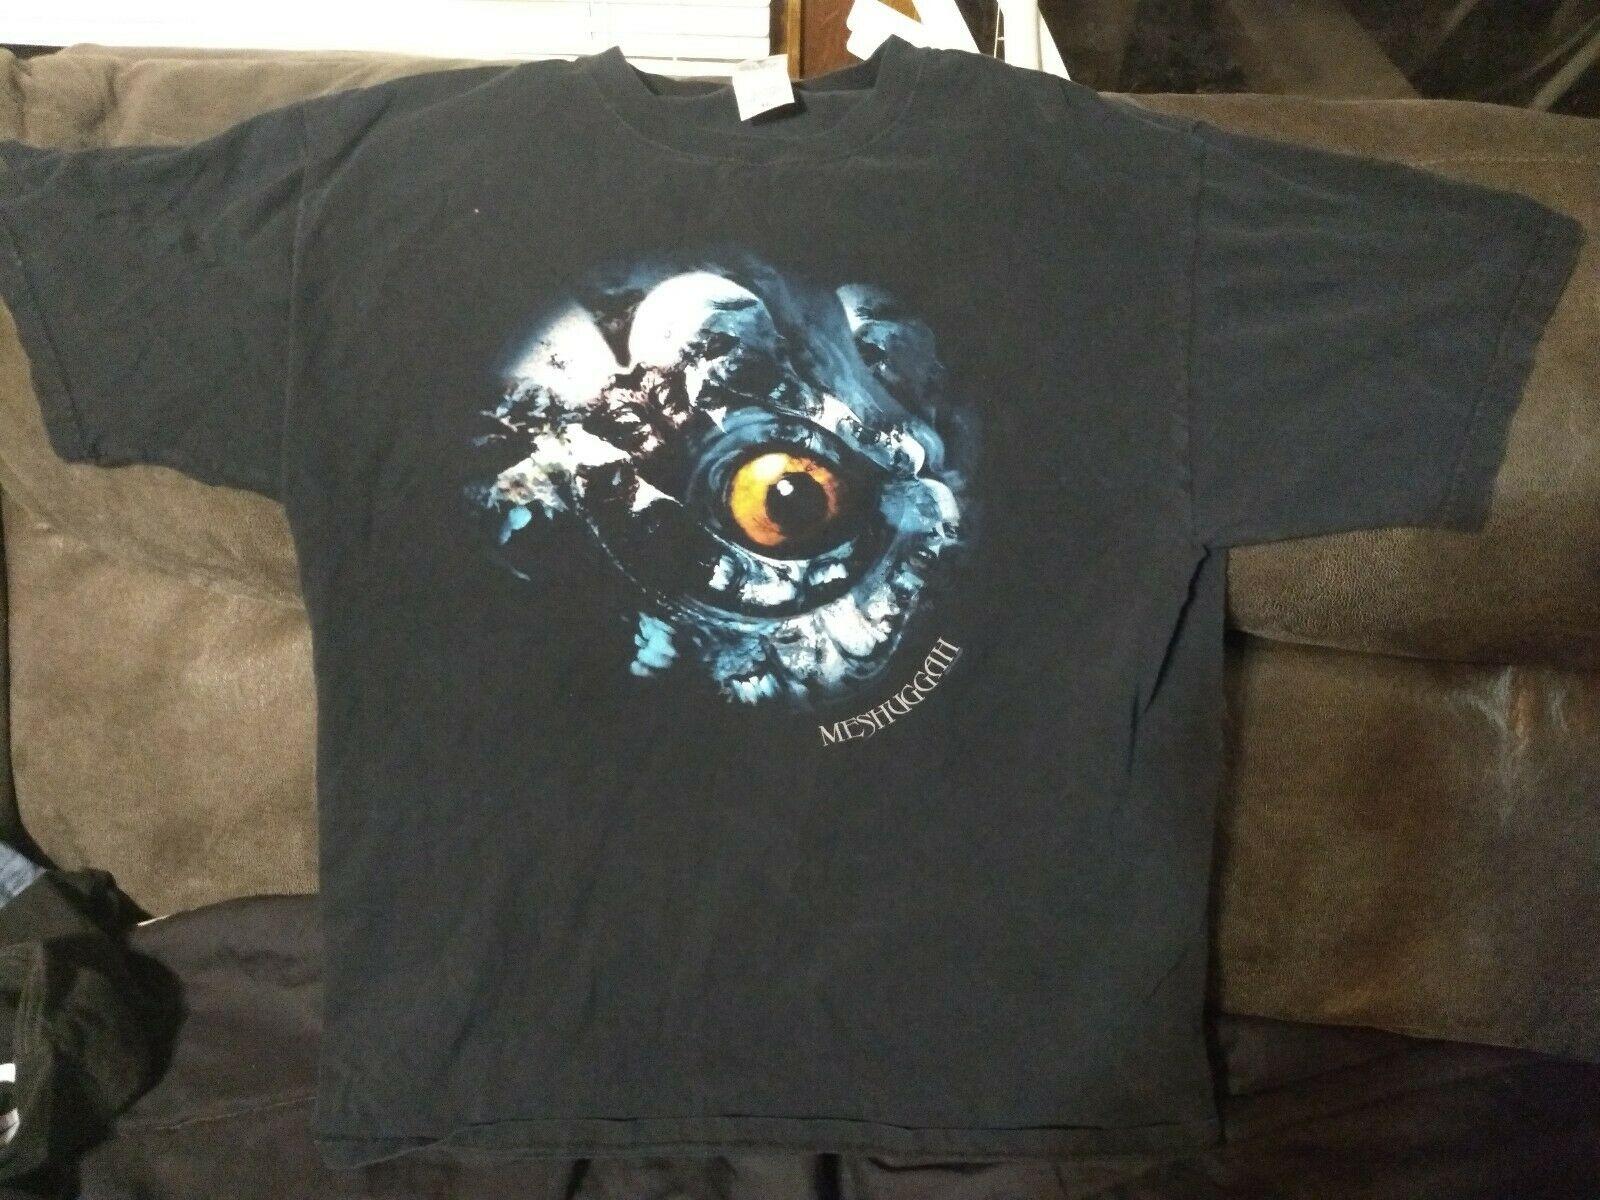 Meshuggah deviantスウェーデンオーディオi目シャツ 2005 大djent prog金属